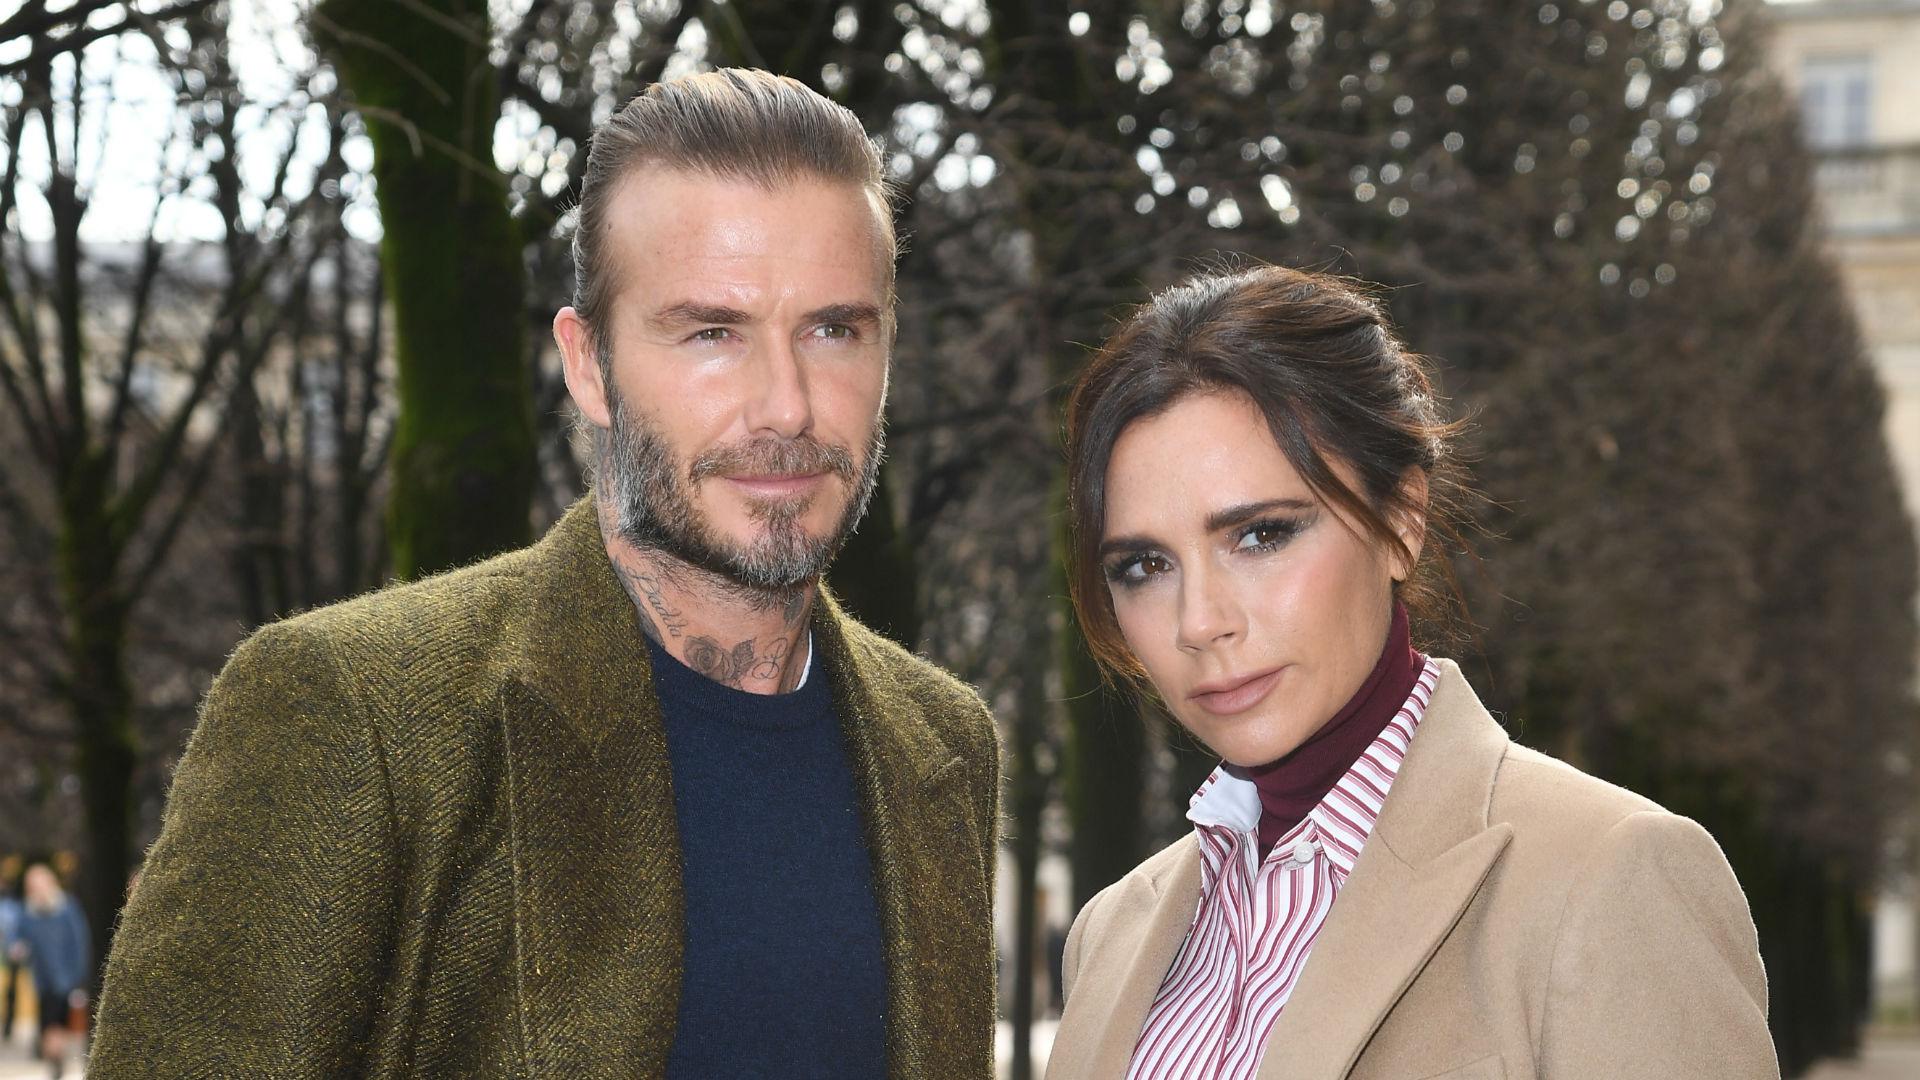 David Beckham dating lista Incontri squadra magma grugnito capitolo 9